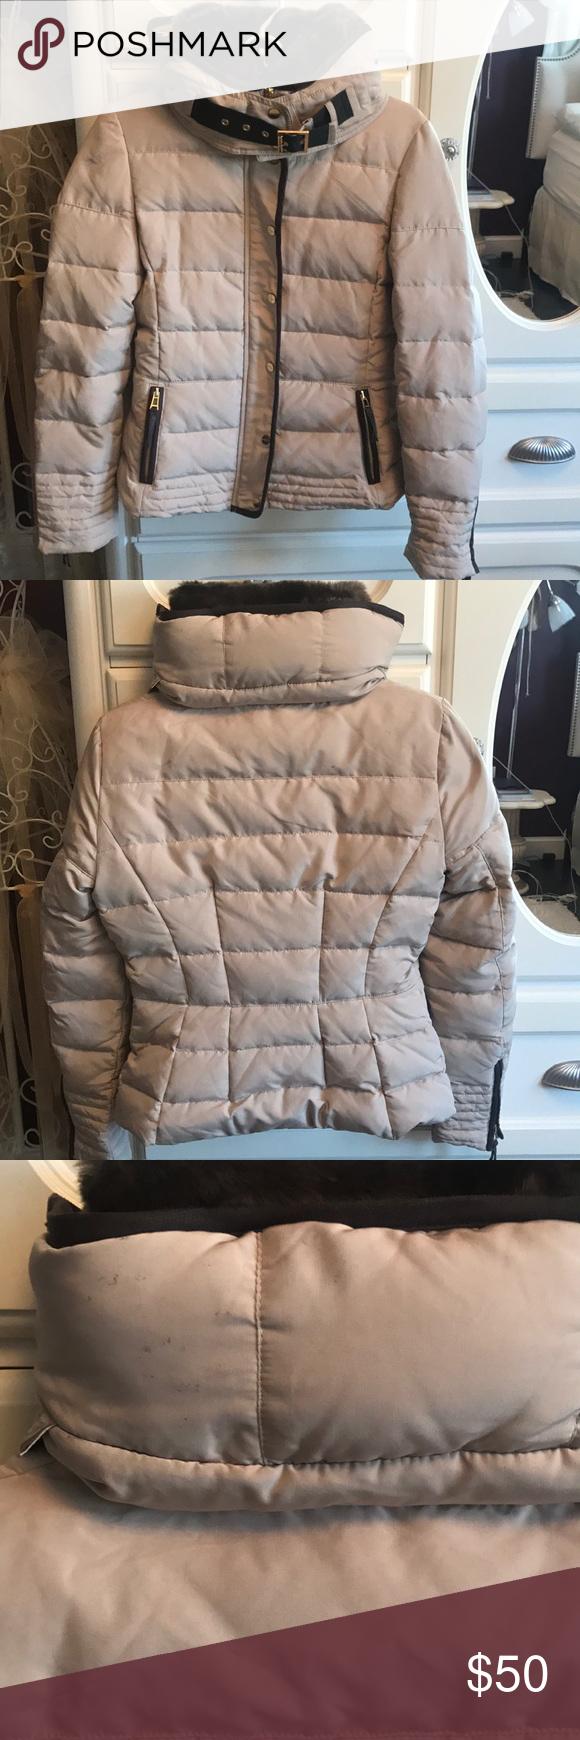 Zara Sand Hooded Puffer Jacket With Buckle Jackets Zara Winter Jackets [ 1740 x 580 Pixel ]